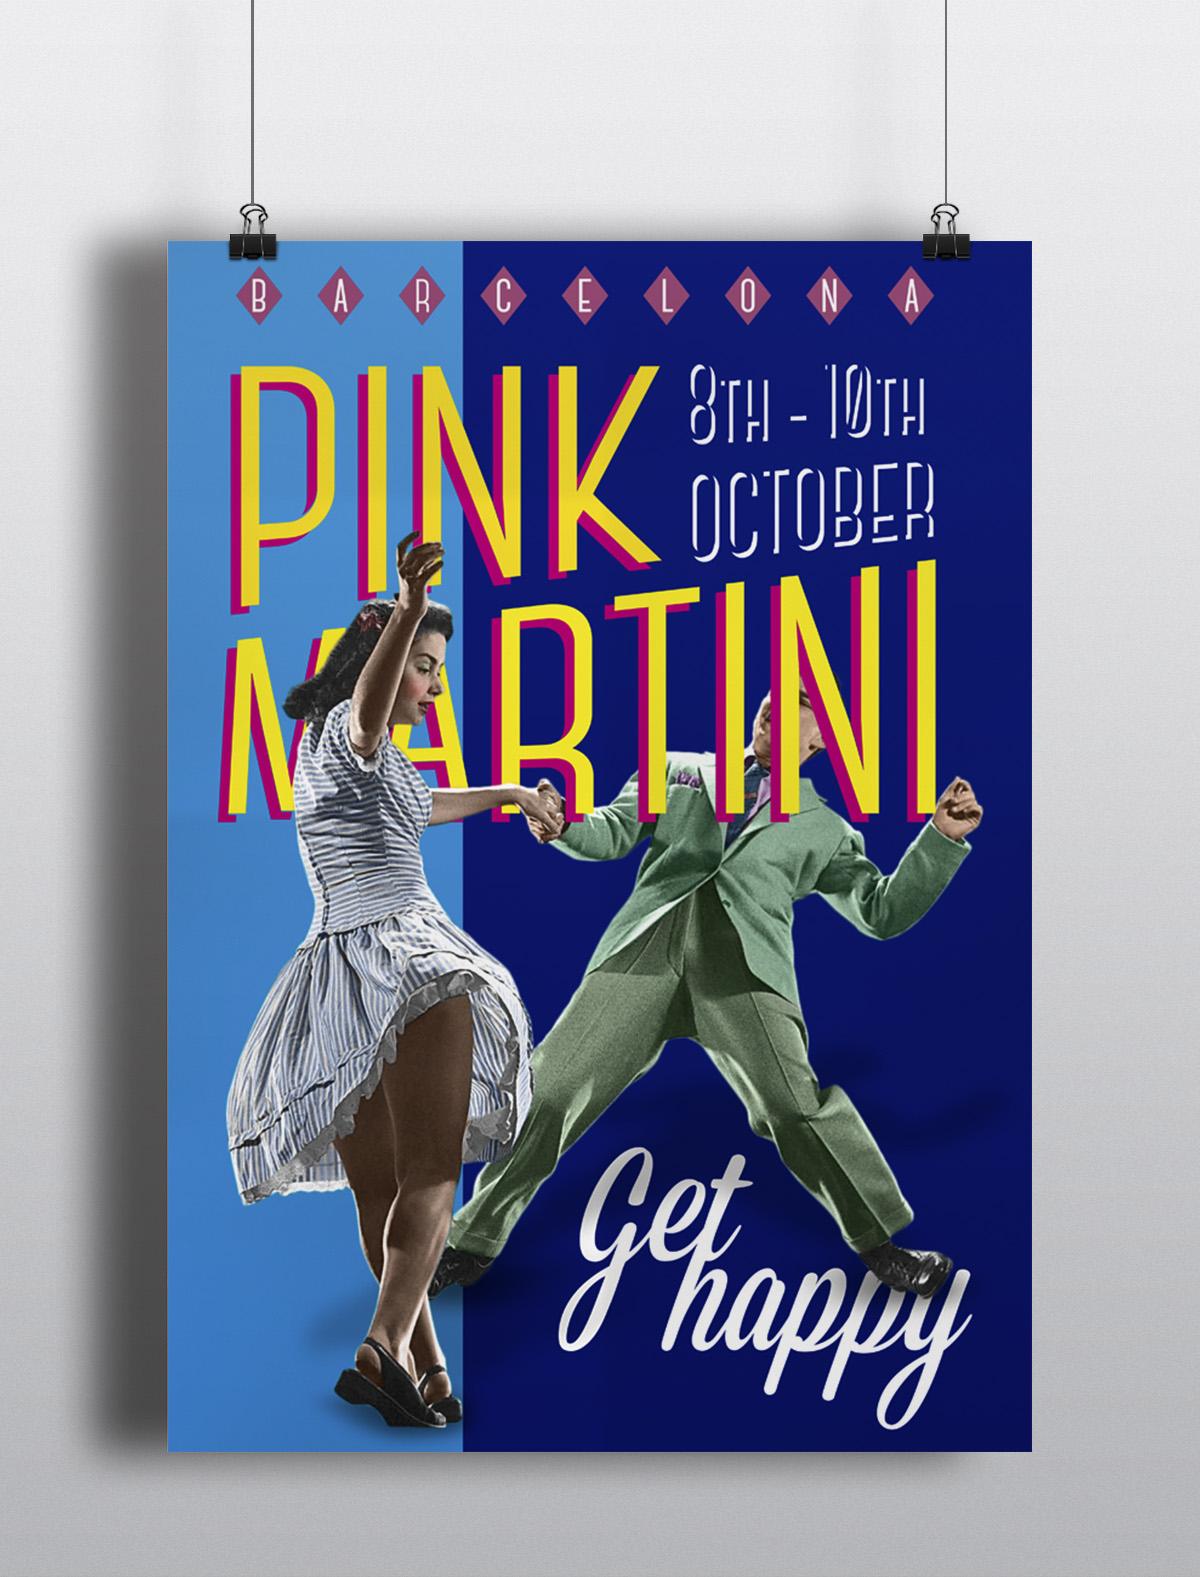 jordimasdisseny_pinkmartini